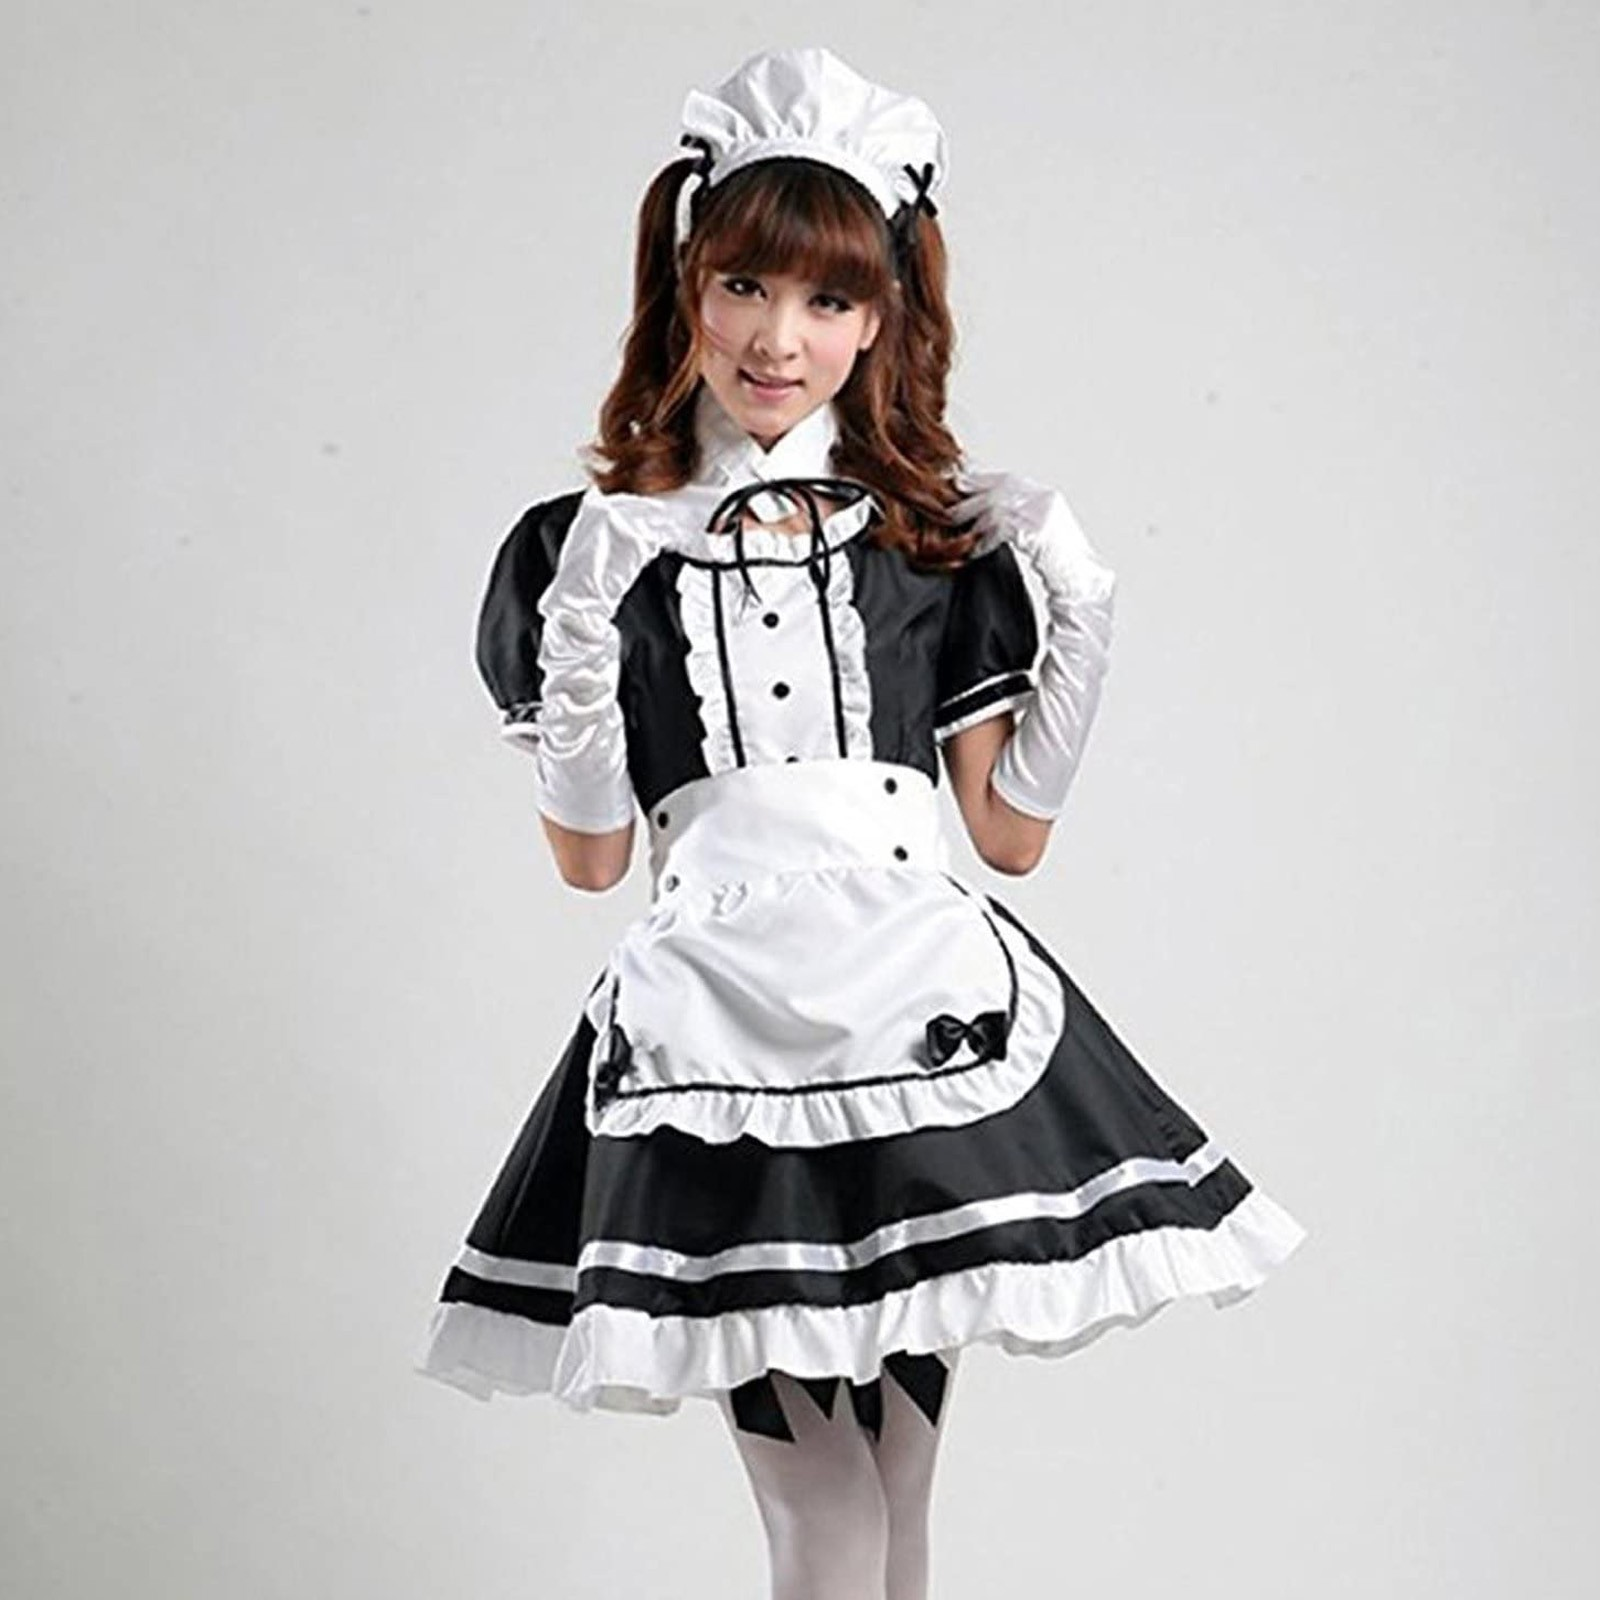 2021 preto bonito lolita maid trajes vestido de empregada francesa meninas mulher amine cosplay traje empregada doméstica festa trajes palco vermelho